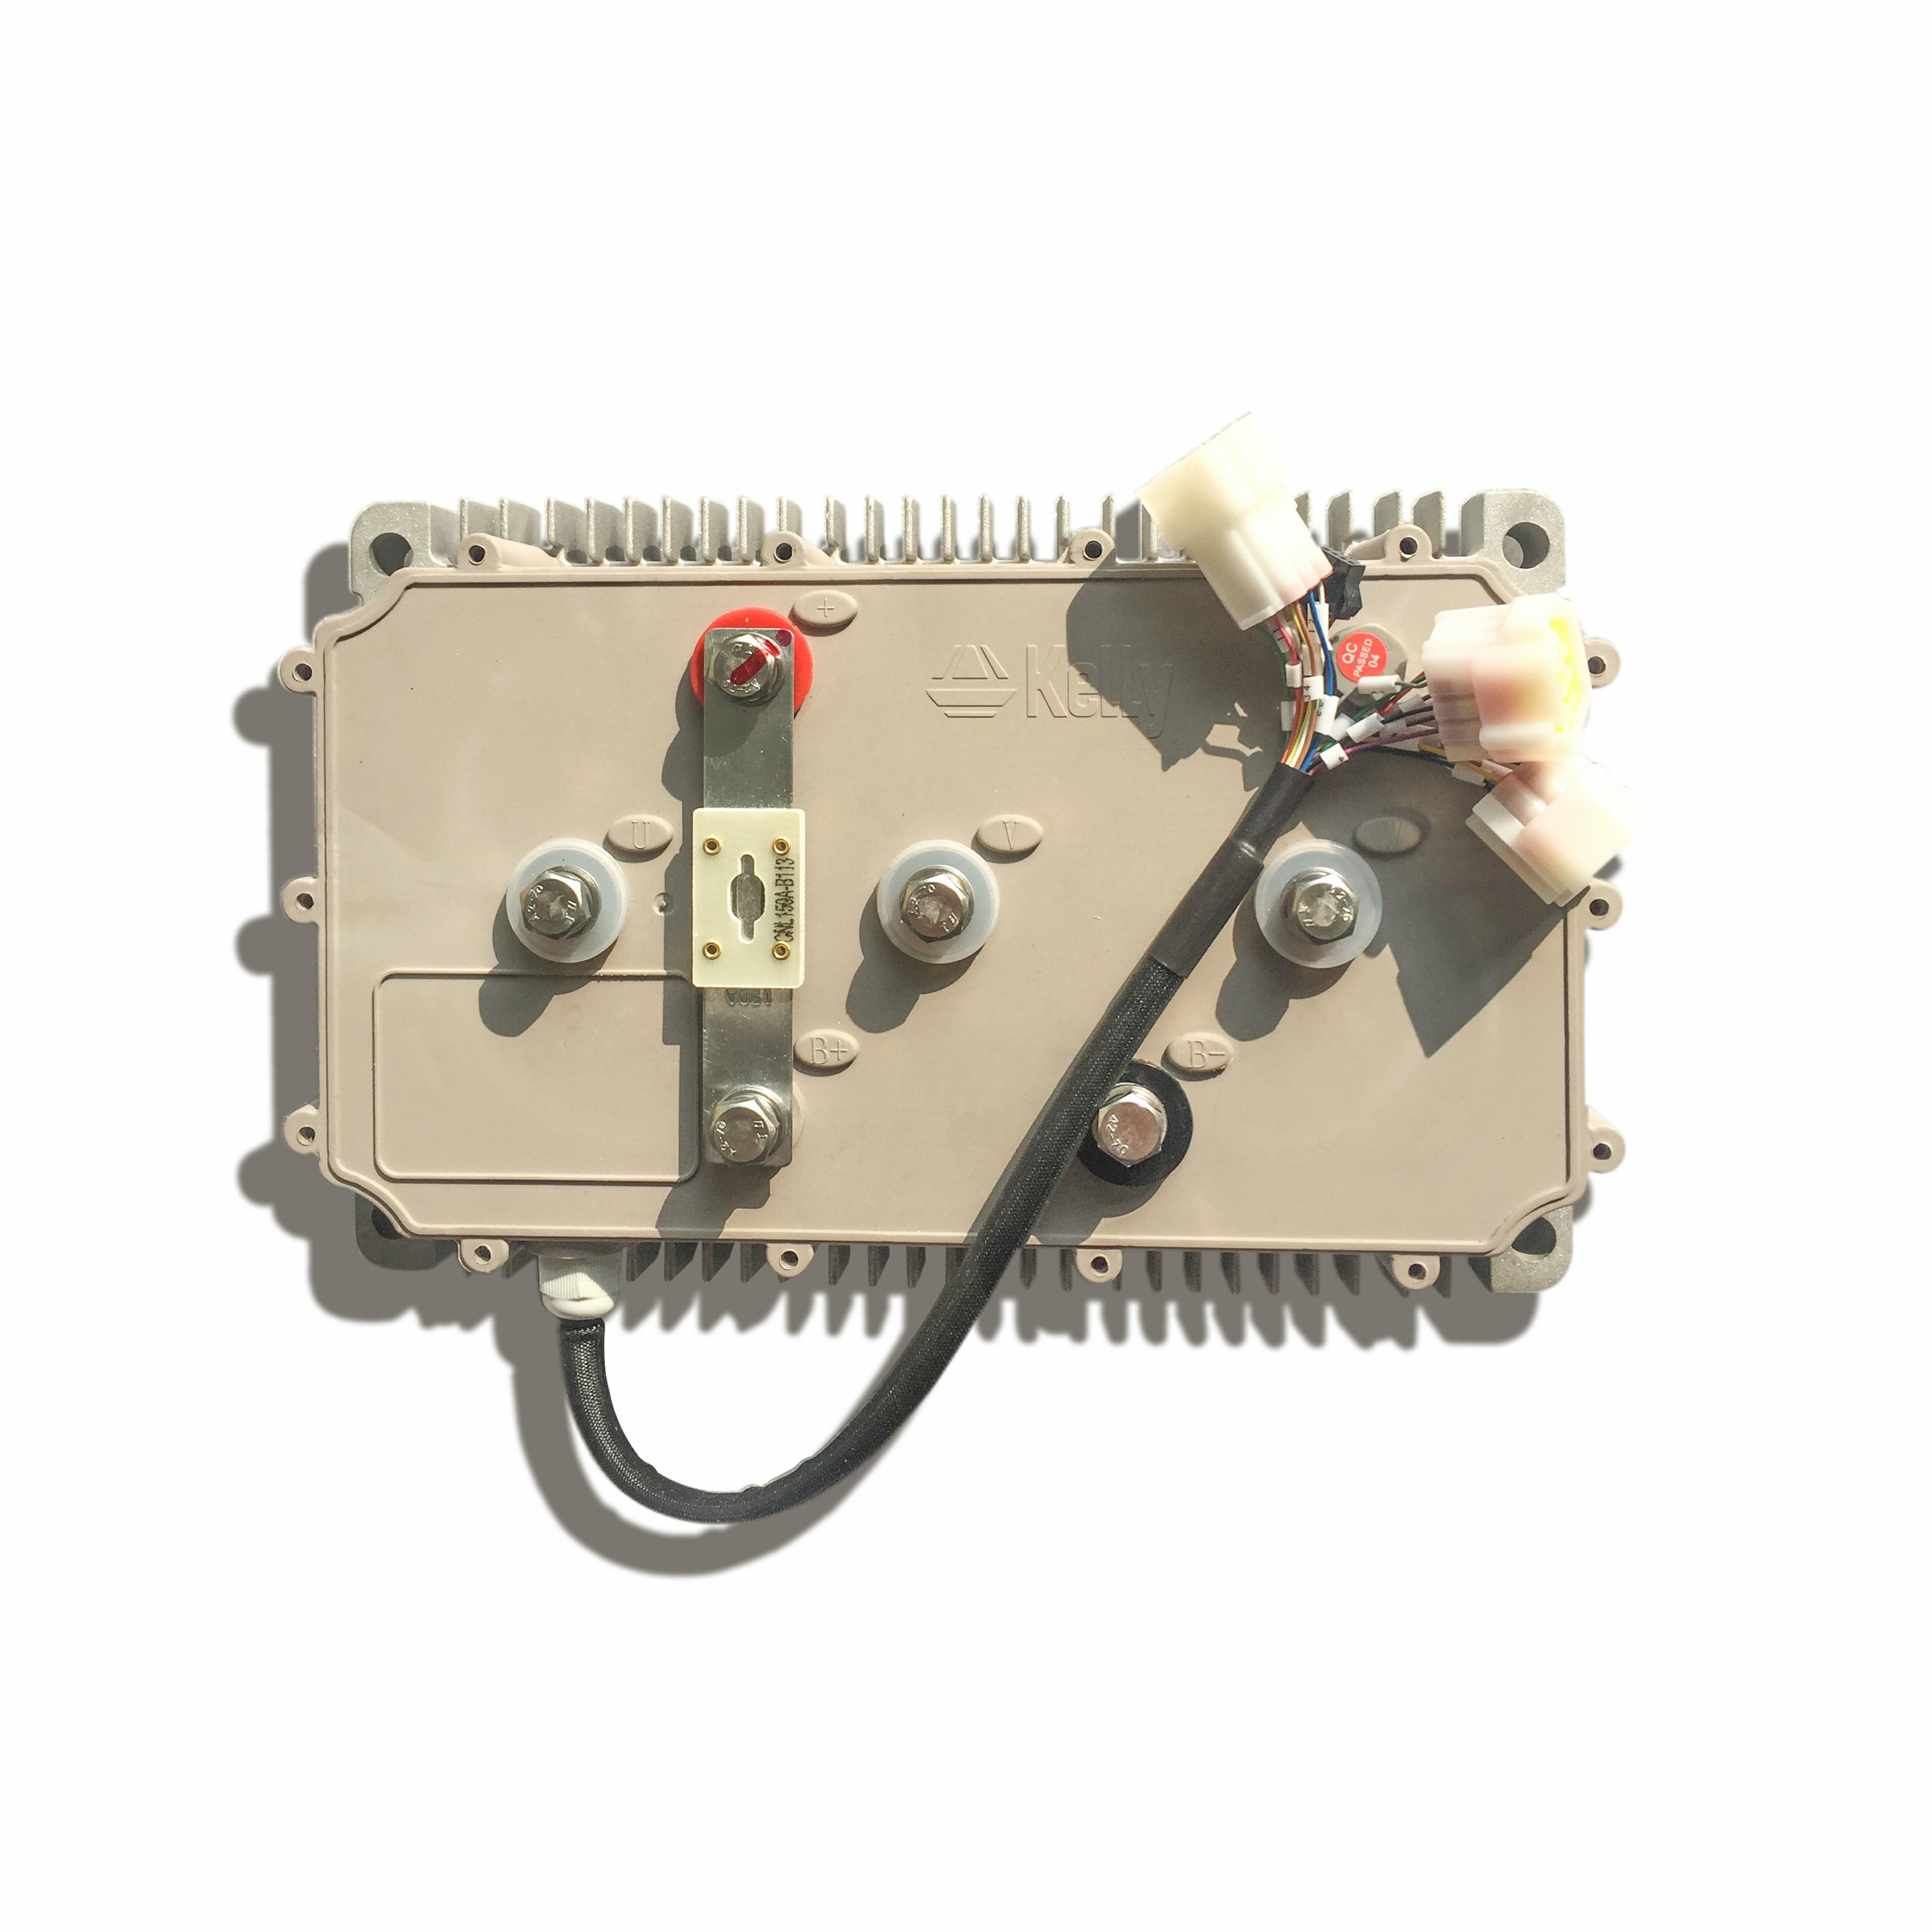 KLS72501-8080I ، 24 فولت-72 فولت ، 500A ، وحدة تحكم المحرك BLDC الجيبية مع CAN